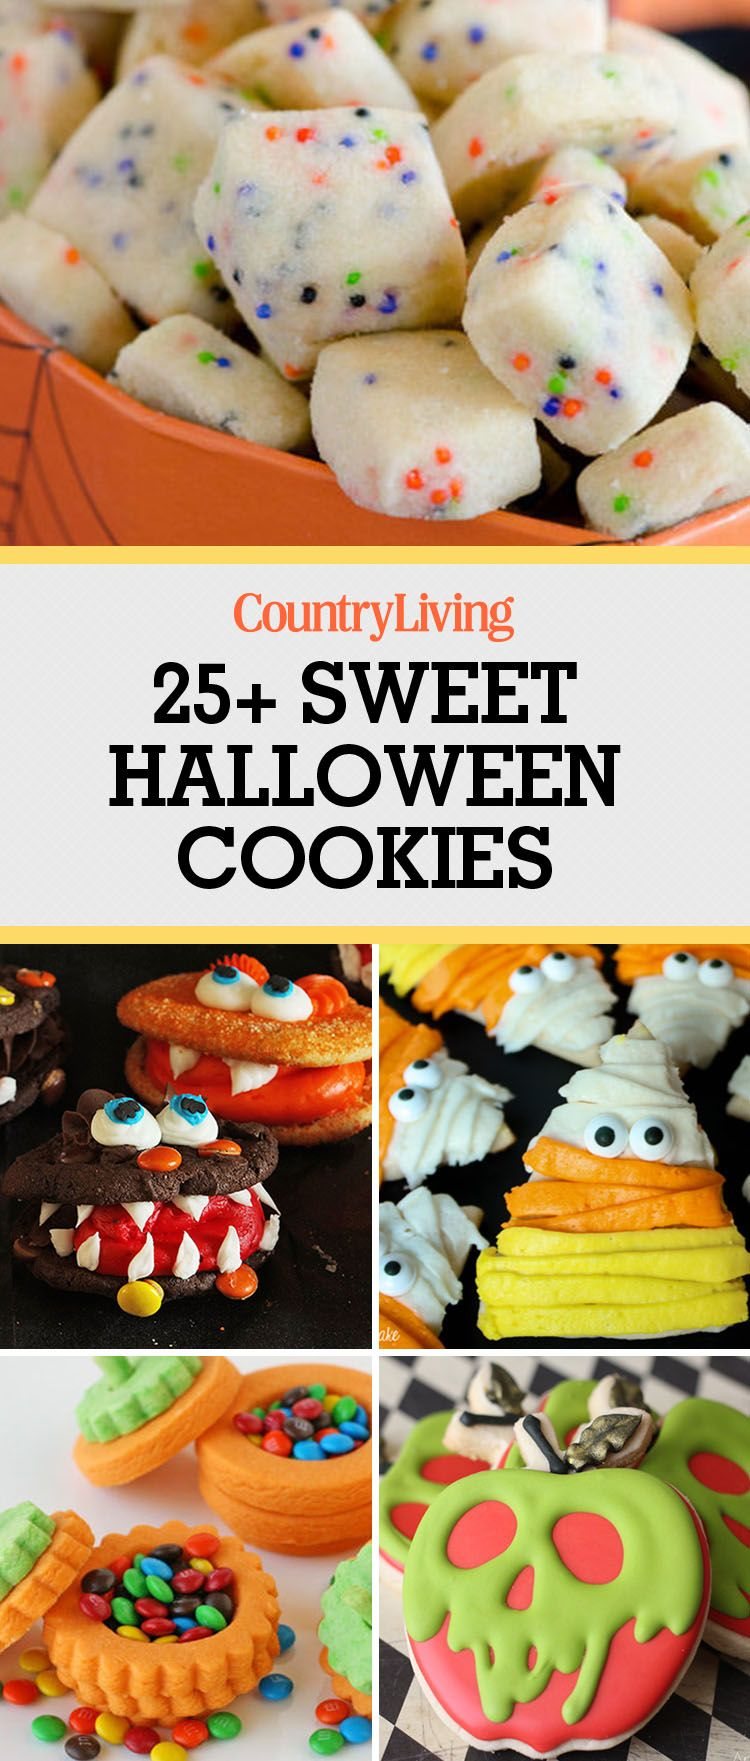 35 easy halloween cookies - recipes & ideas for cute halloween cookies